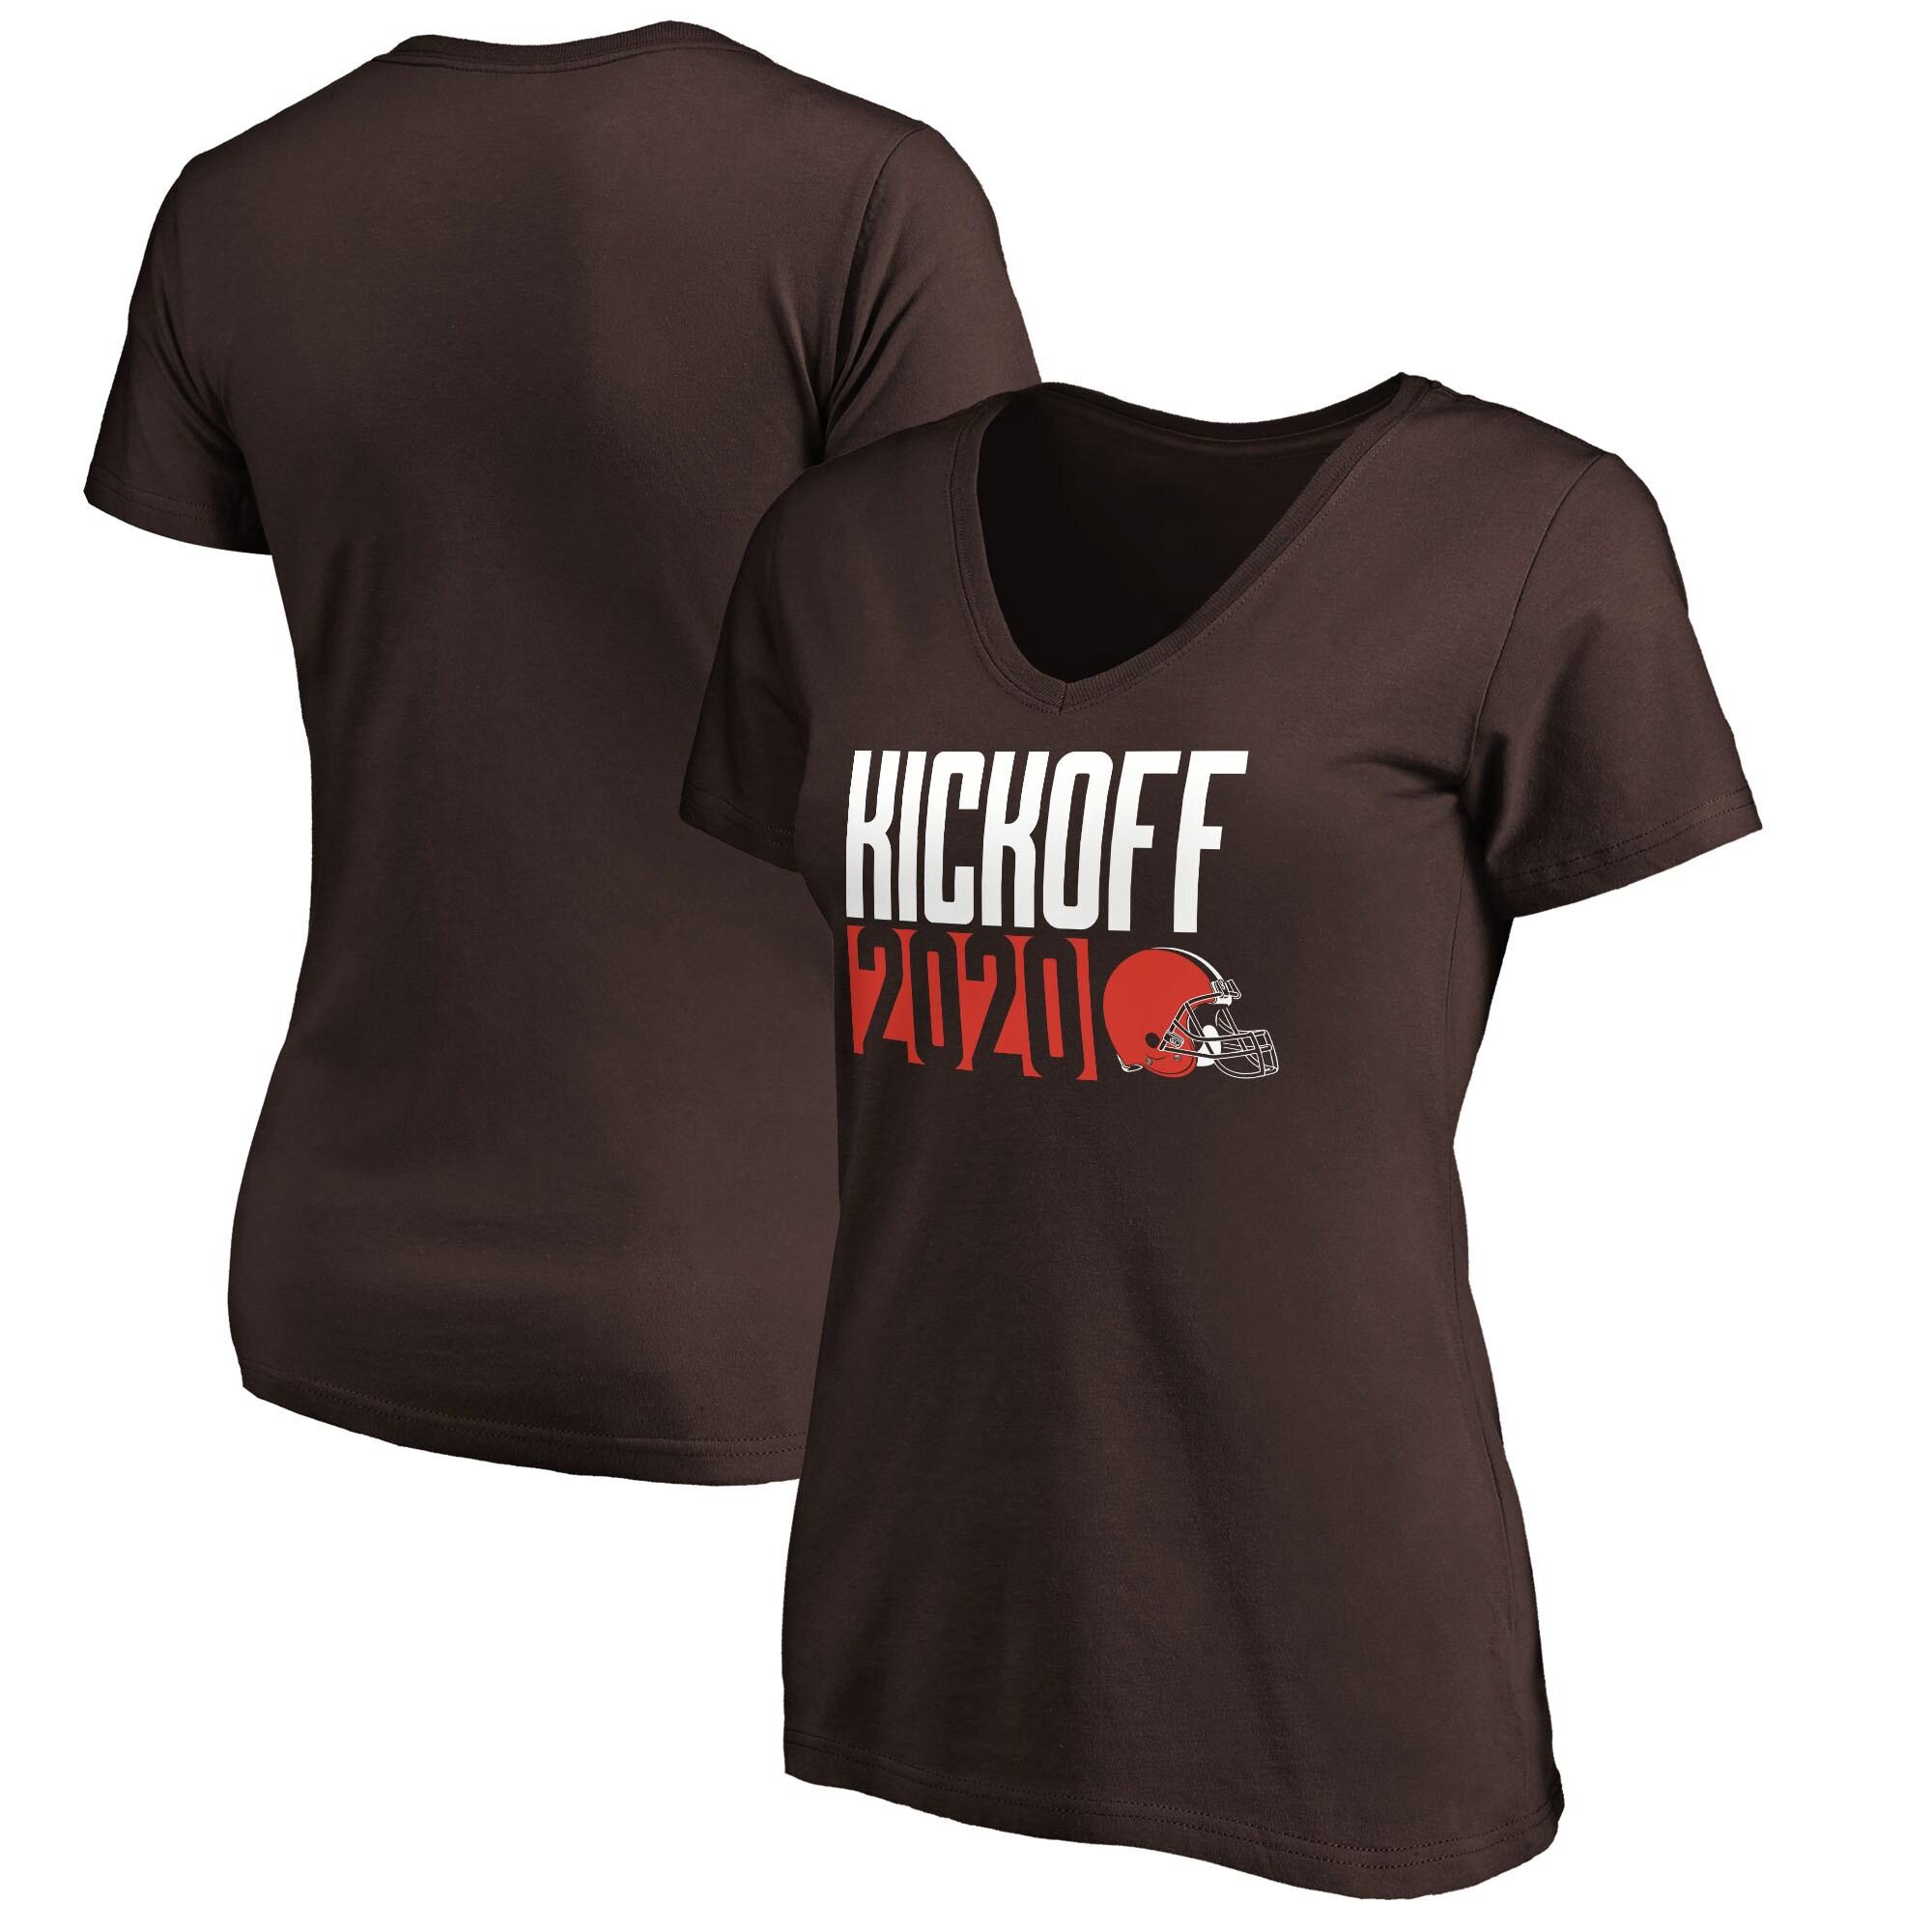 Cleveland Browns Fanatics Branded Women's Kickoff 2020 V-Neck T-Shirt - Brown